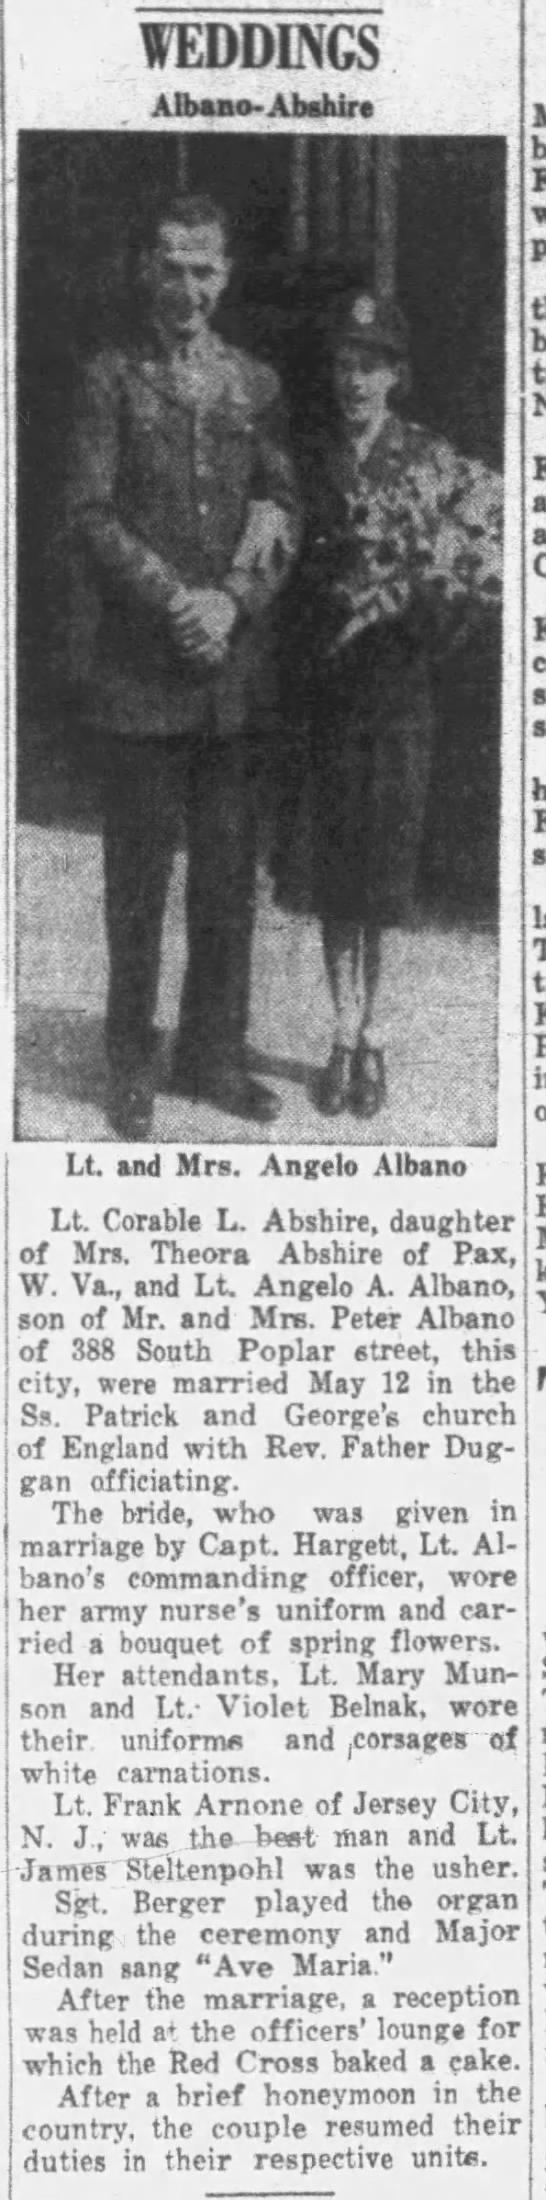 Wedding Angelo A. Albano with Corable Lobertha Abshire Albano (Source: The Plain Speaker Hazleton, Pennsylvania 06 Jul 1944, Thursdy, Page 18)